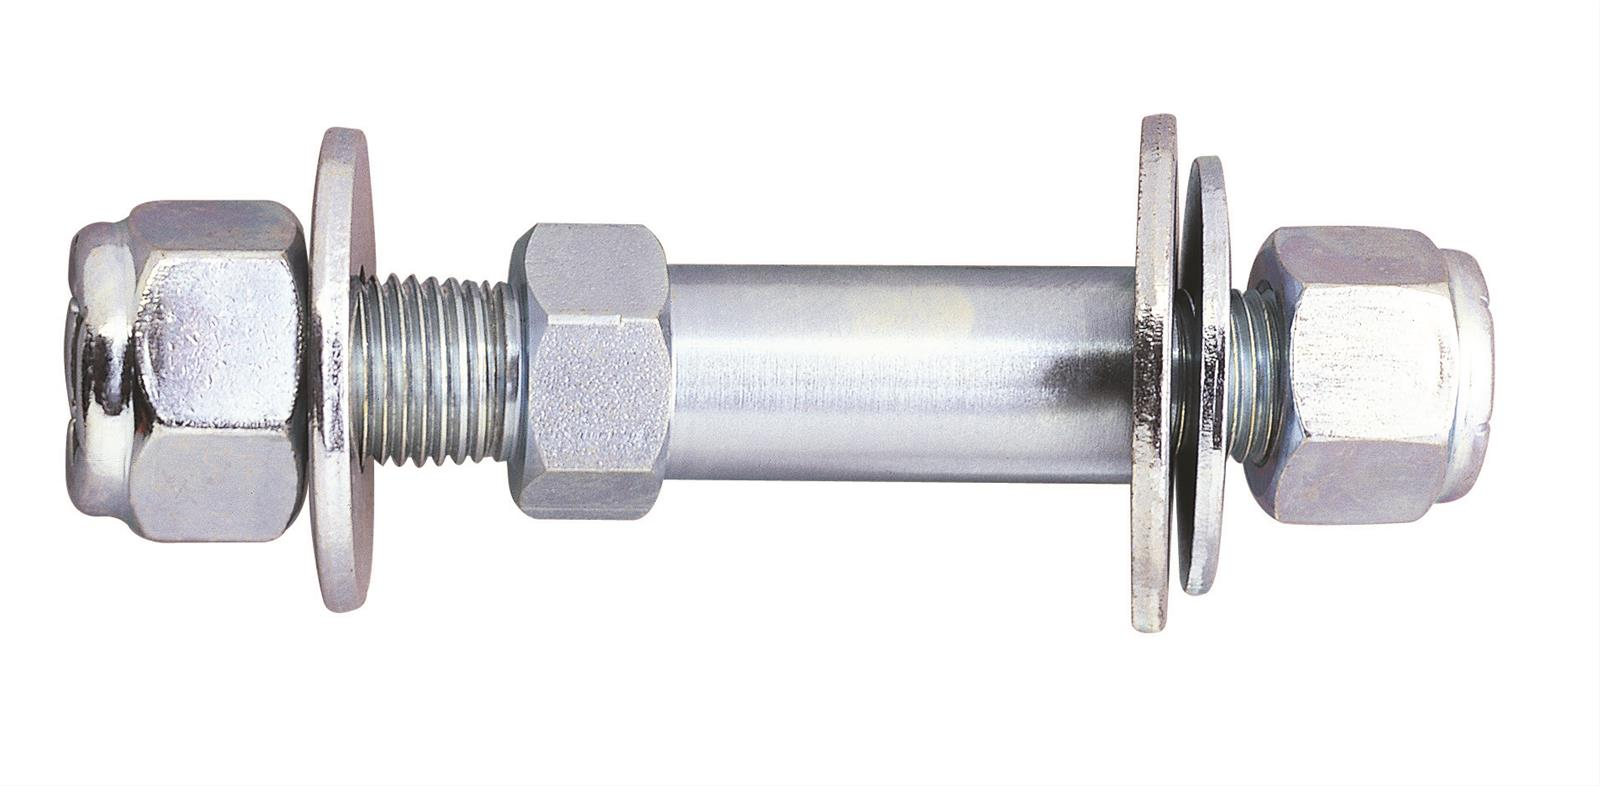 1931 1932 1933 auburn shock absorber mounting bolt